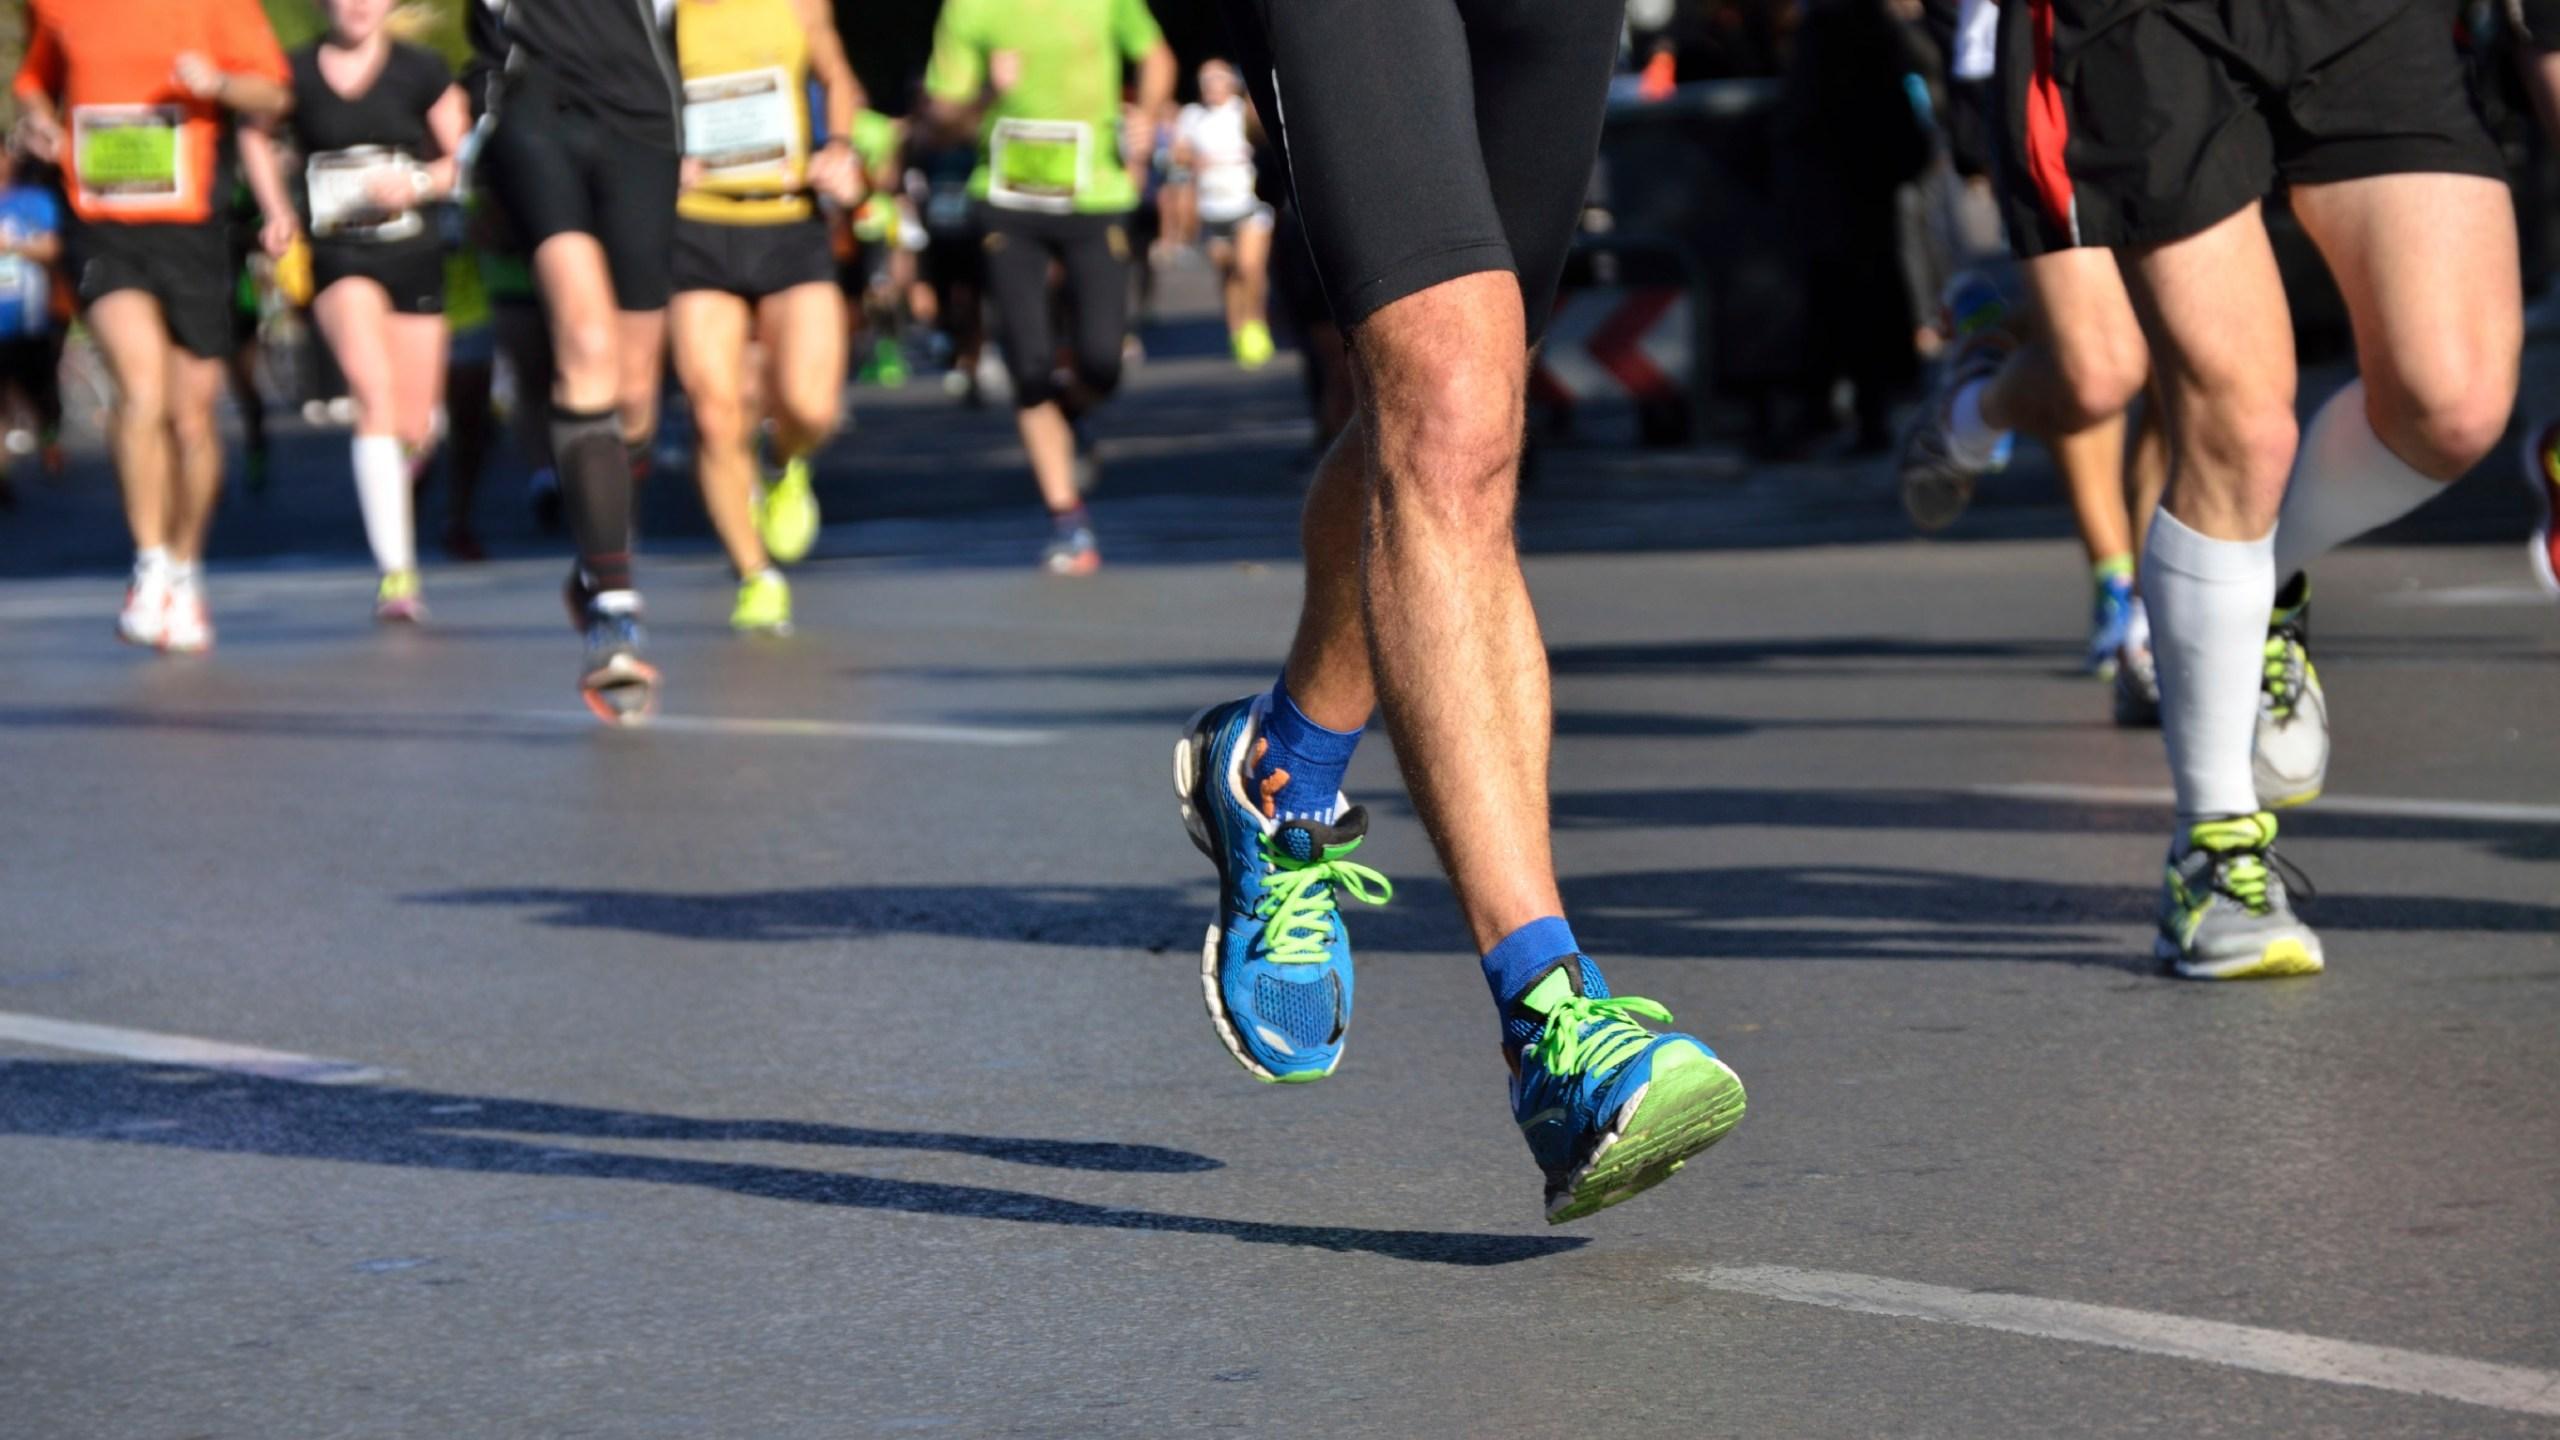 istock generic running marathon_164628